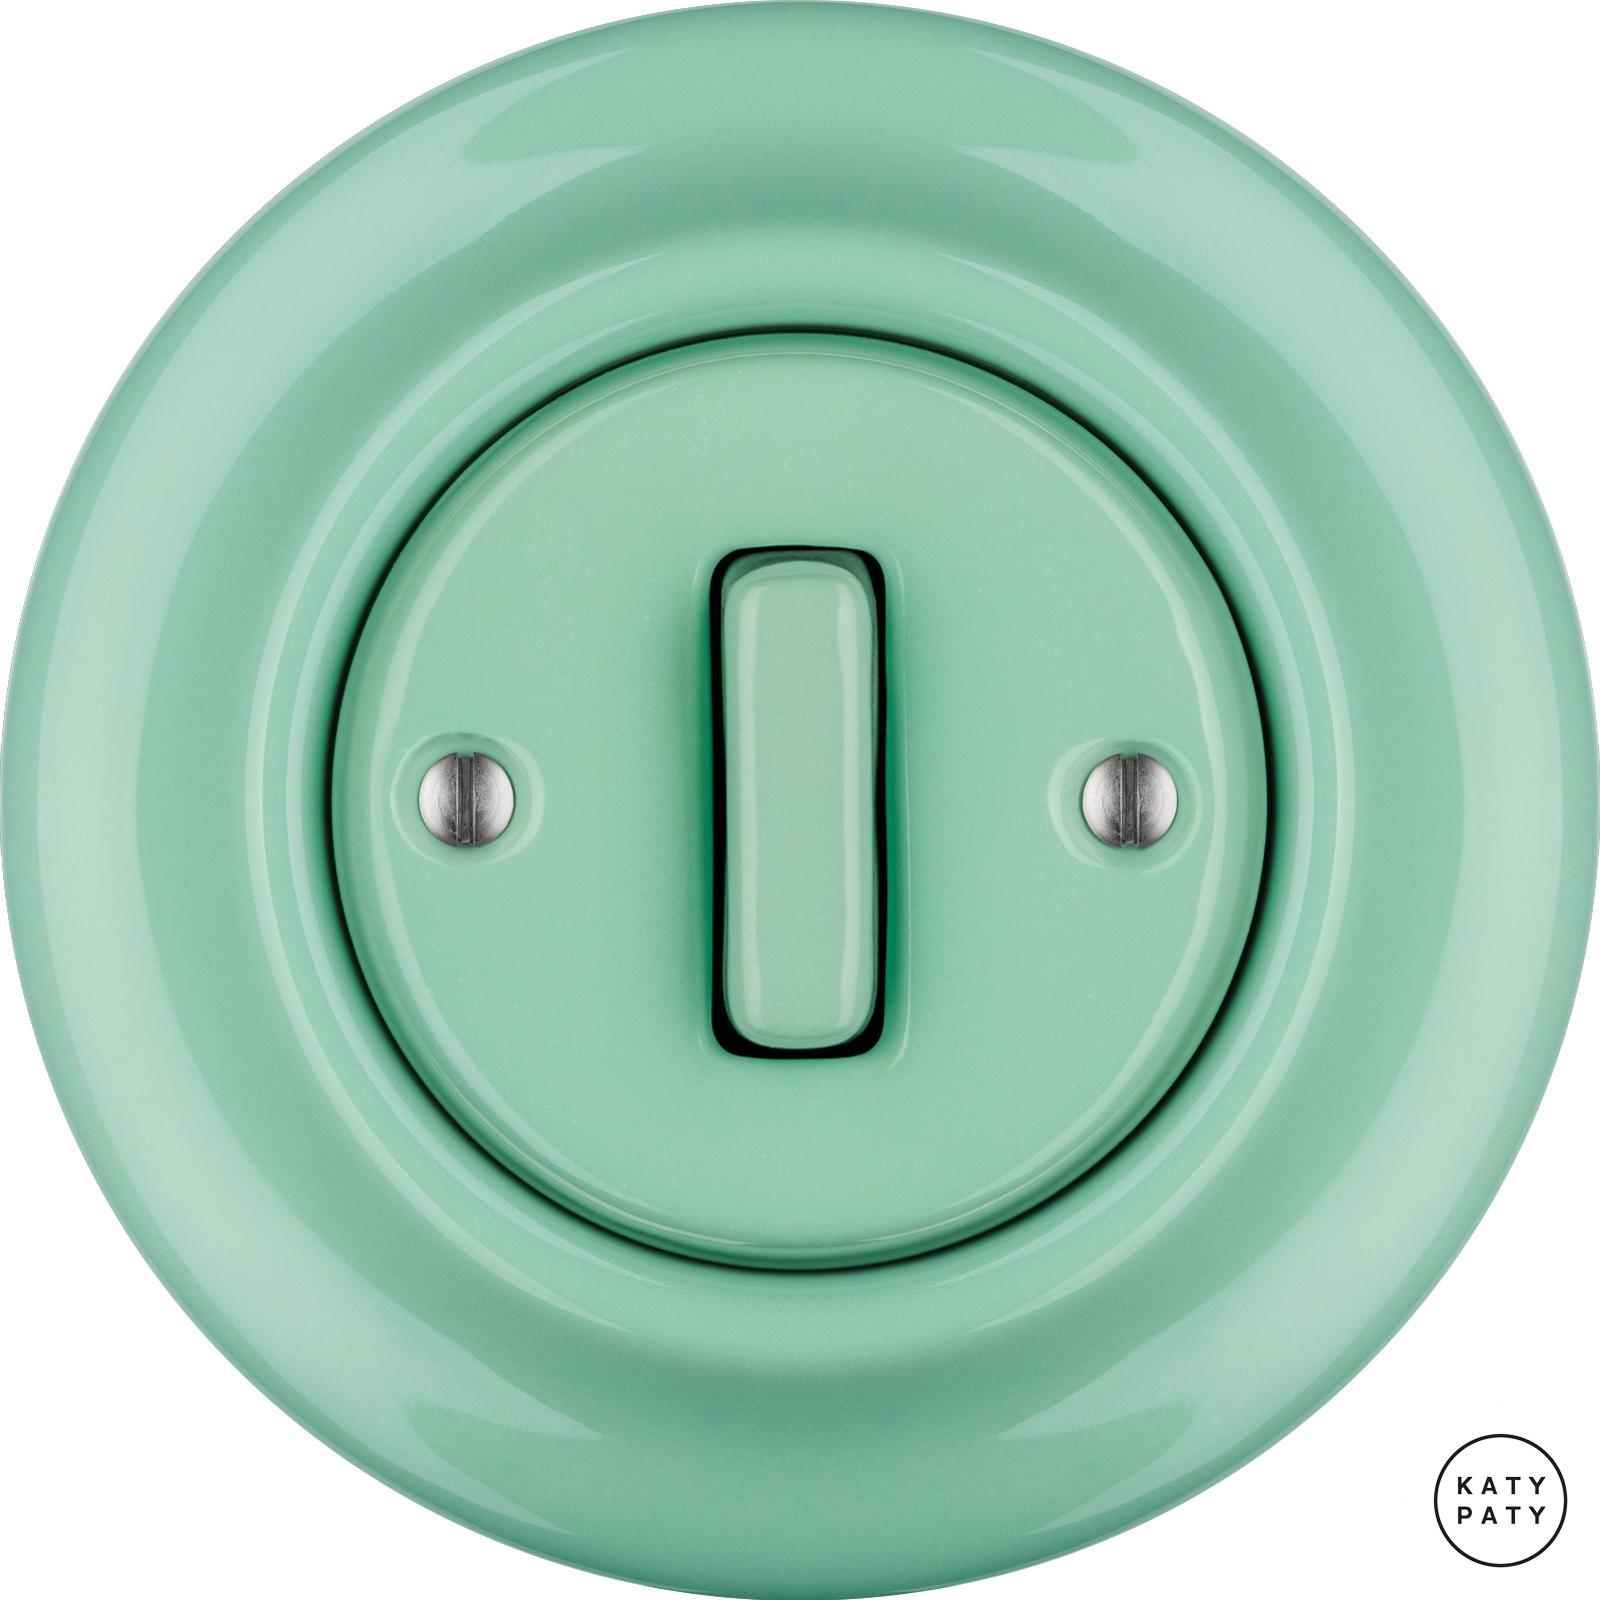 Roo Porzellan Lichtschalter - 1 Taste – SLIM - PNOE MENTOL   Katy Paty